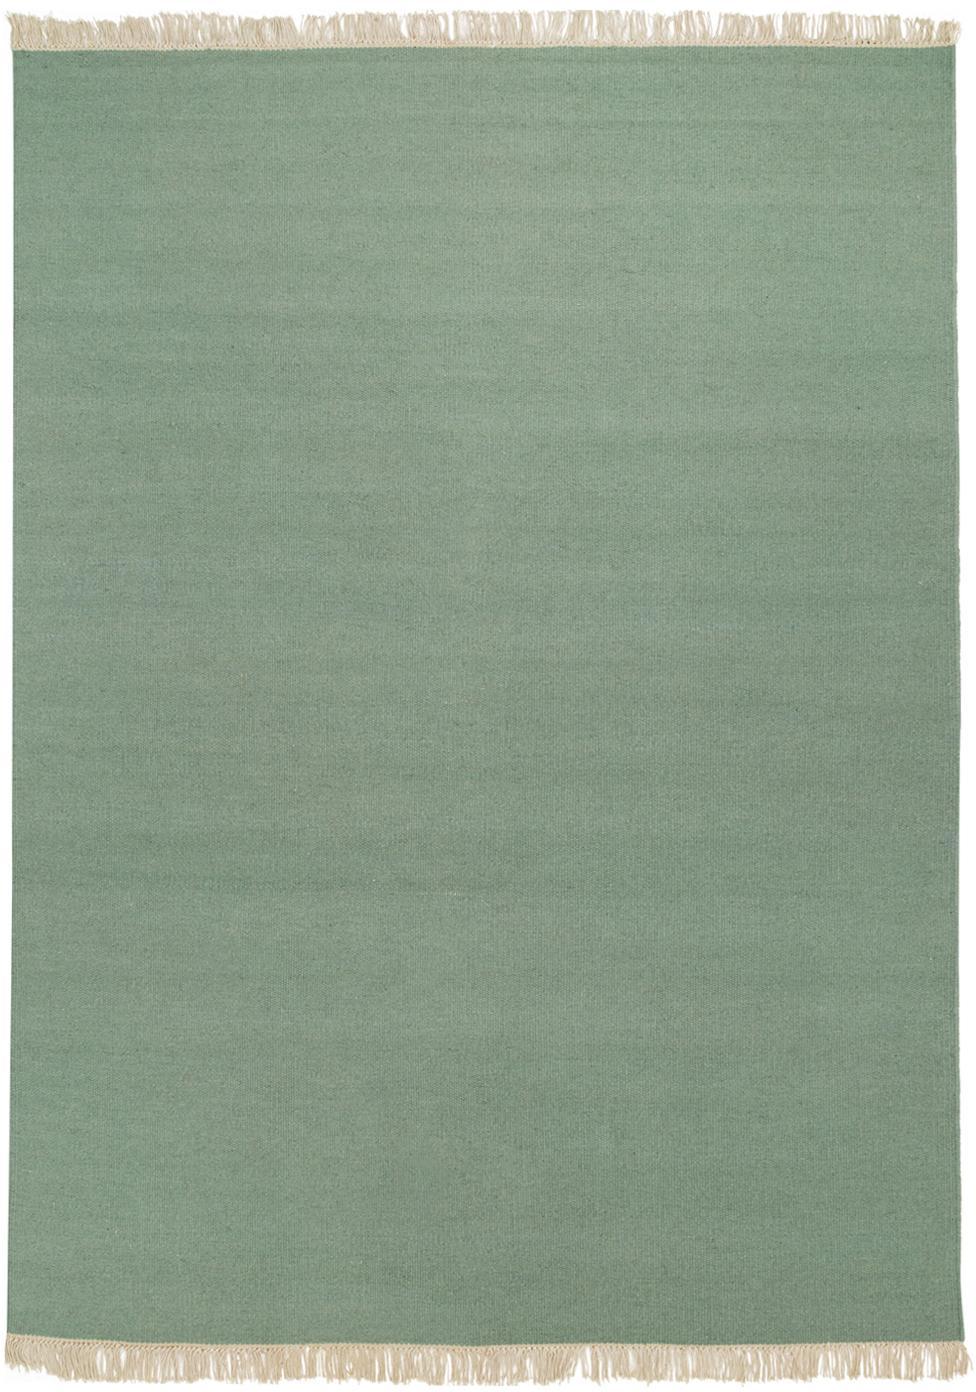 Alfombra artesanal de lana con flecos Rainbow, Flecos: 100%algodón, Pistacho, An 140 x L 200  cm(Tamaño S)